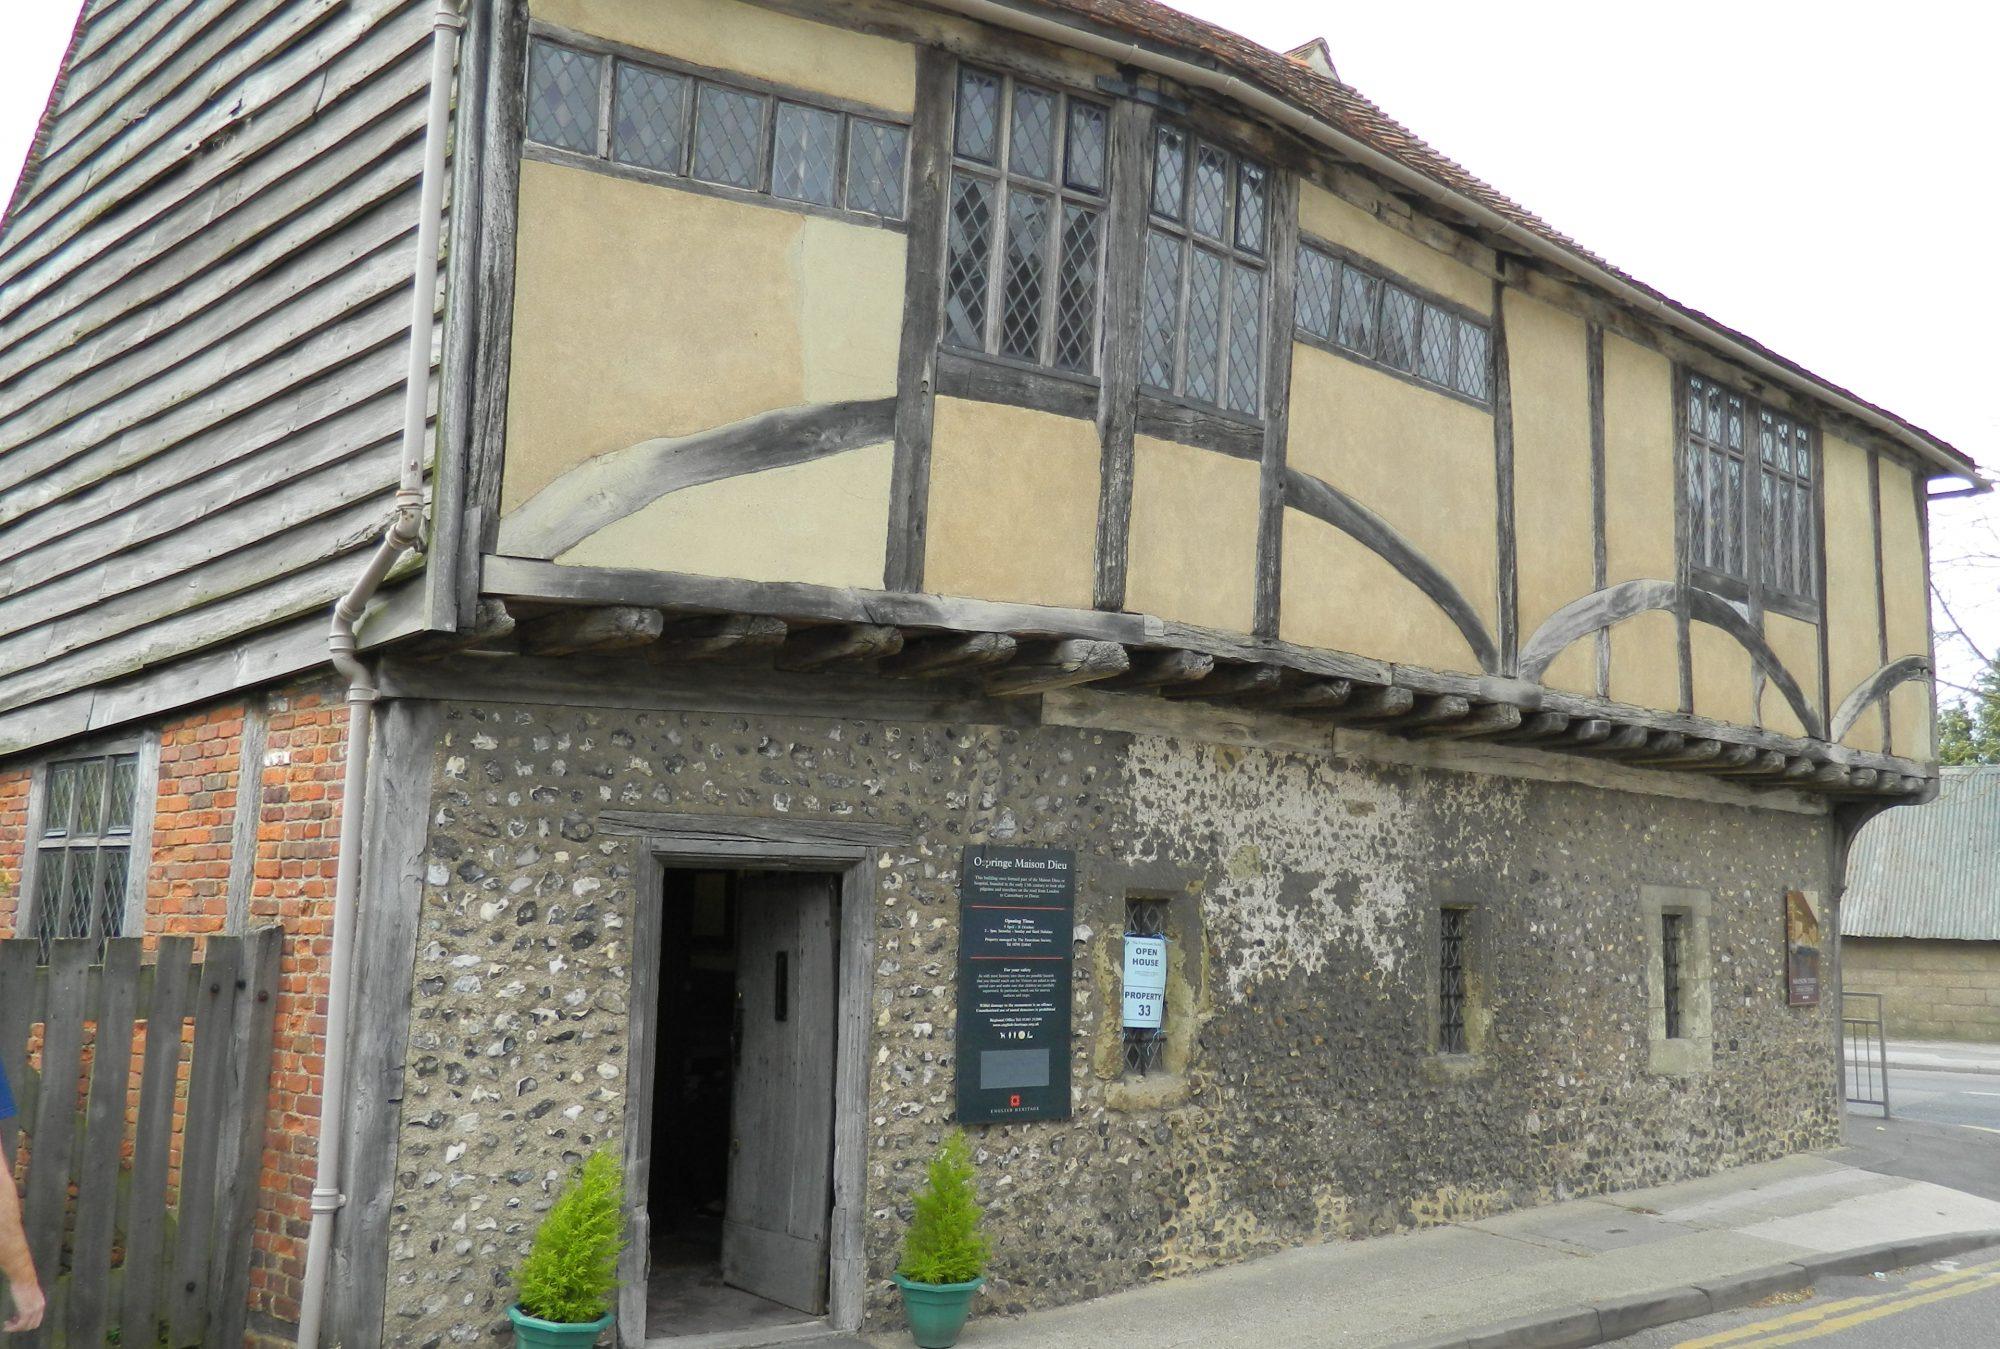 Maison Dieu Museum Trust